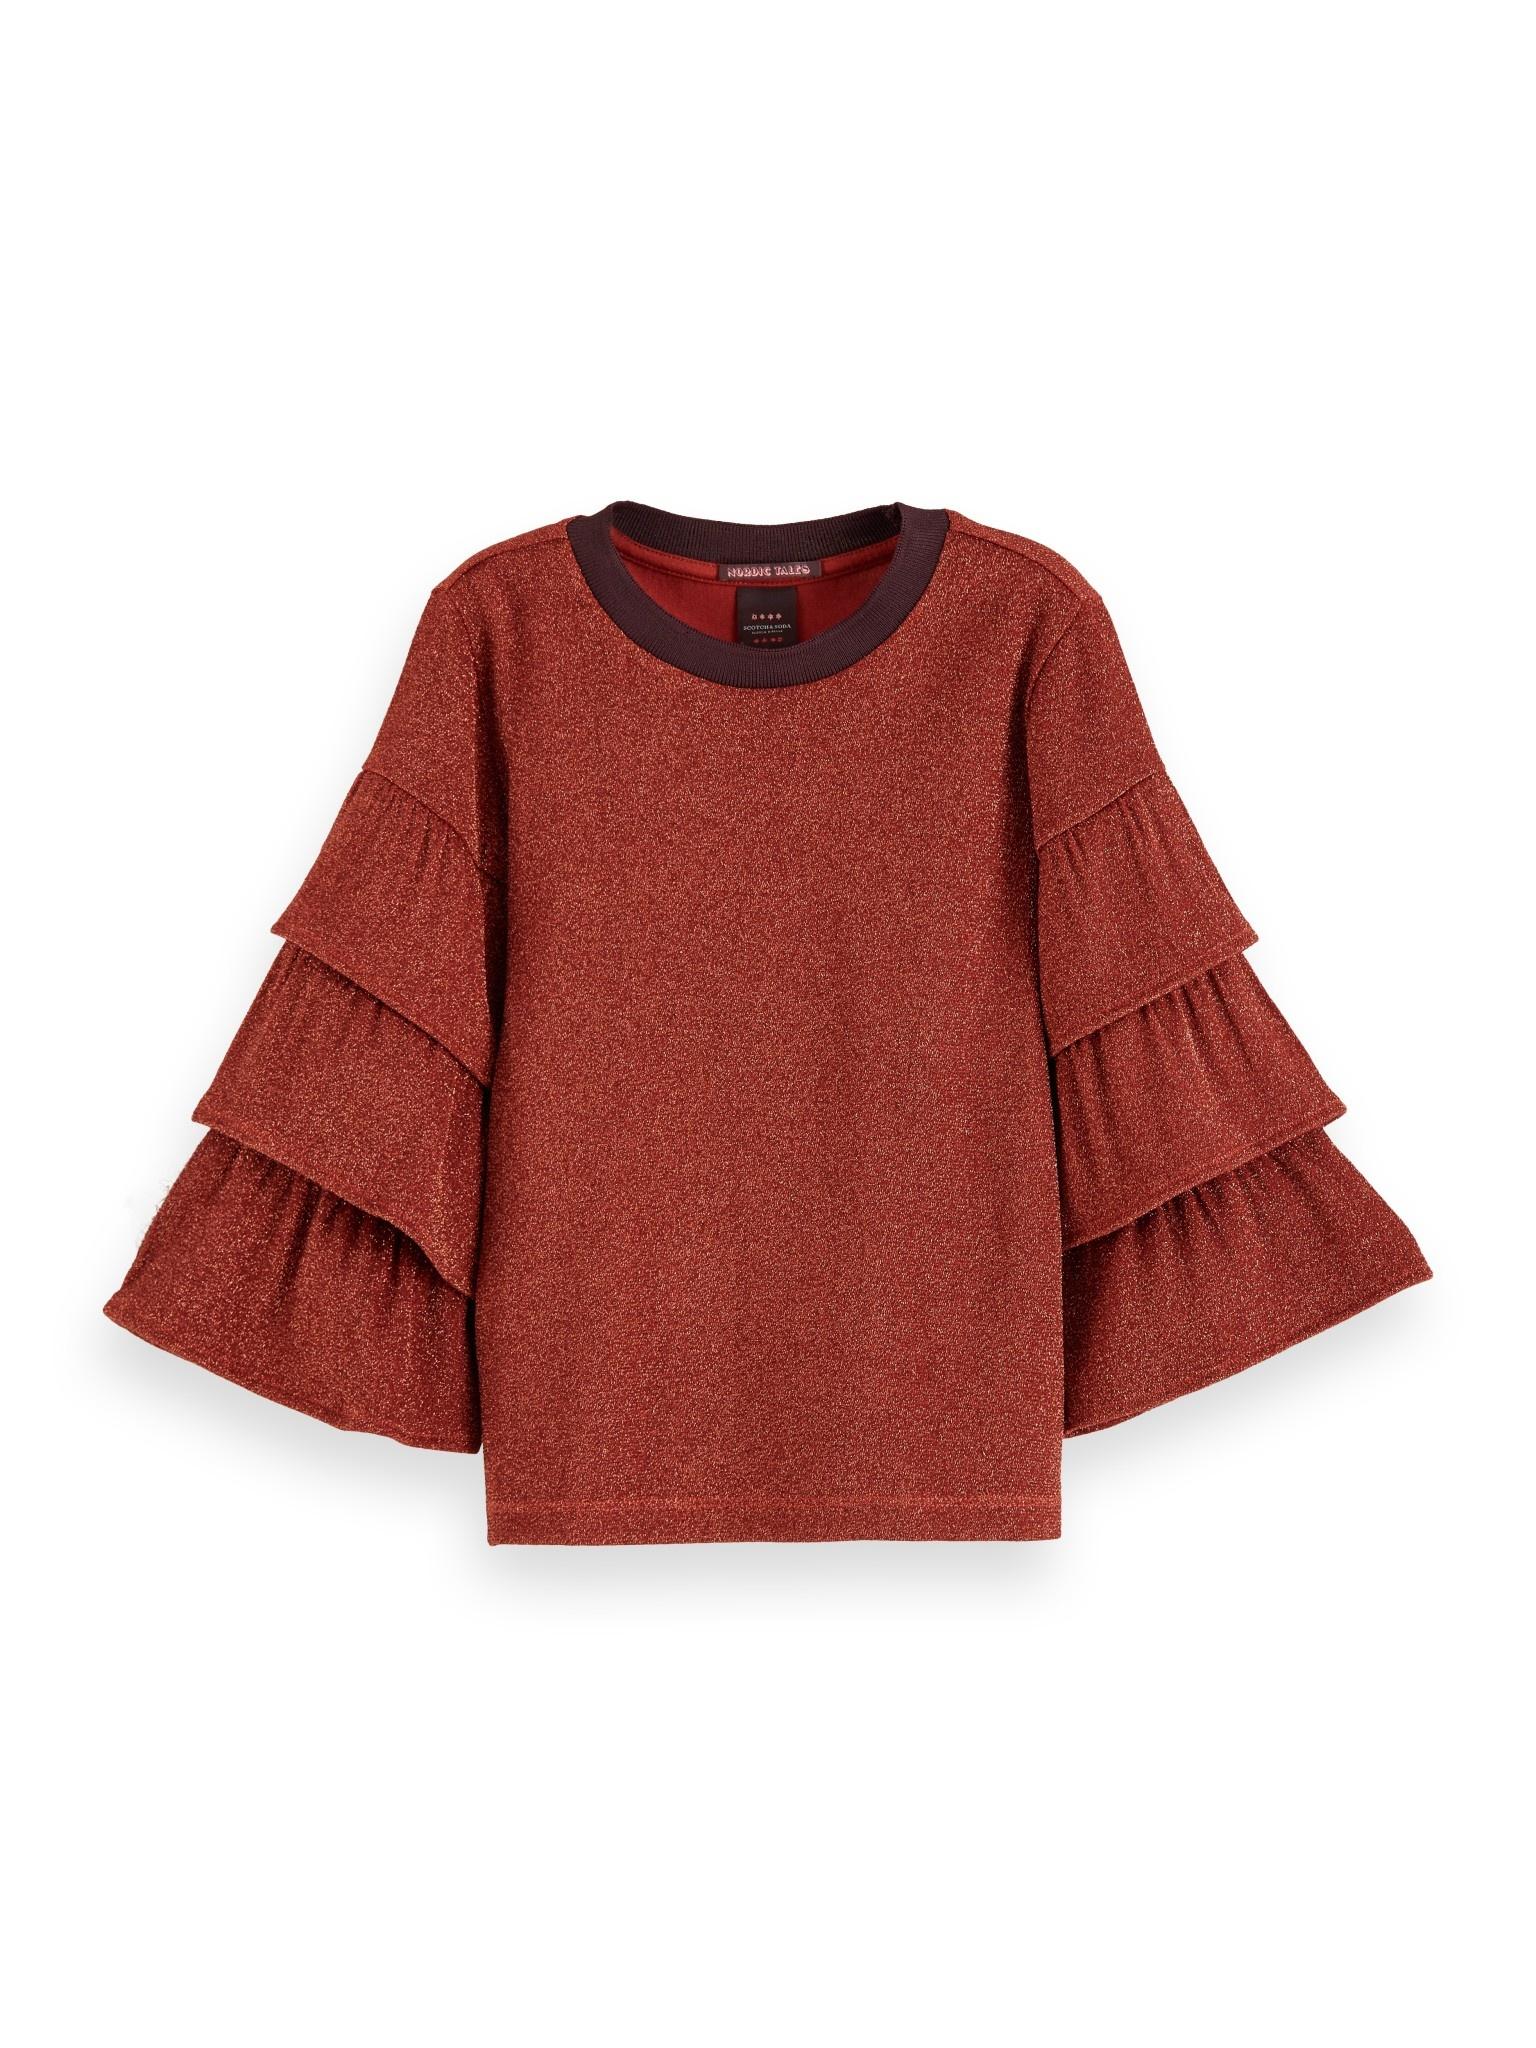 Scotch Rbelle Scotch - Jersey tee ruffle sleeves, 3836, 158080